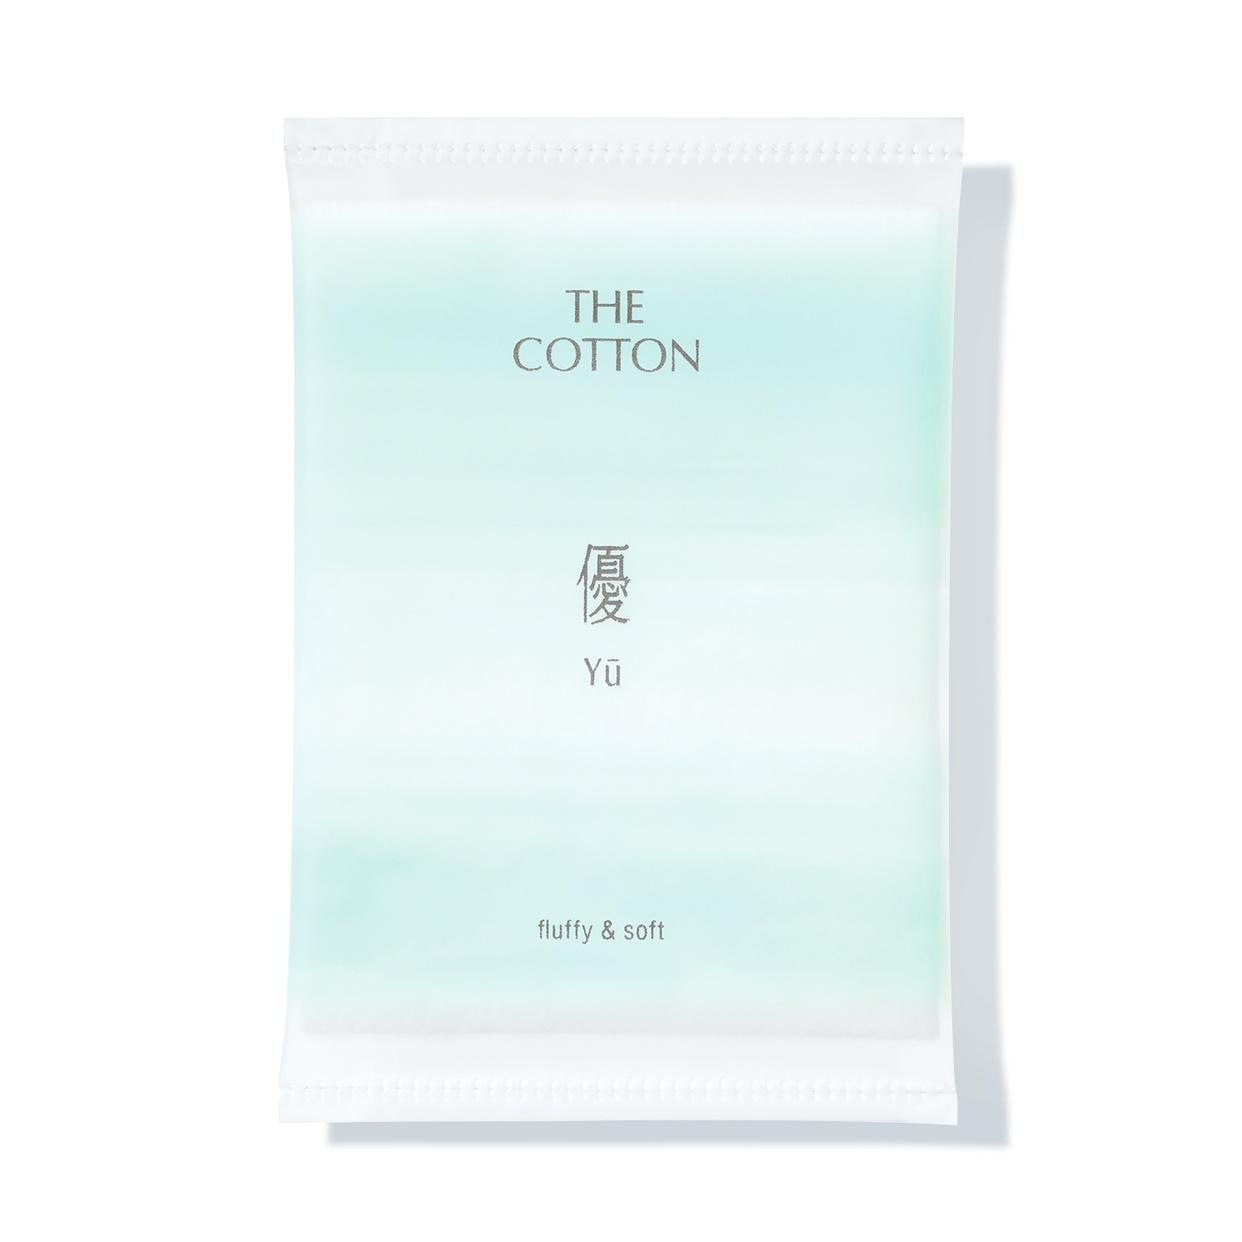 THE GINZA(ザ・ギンザ) ザ・コットン 優の商品画像